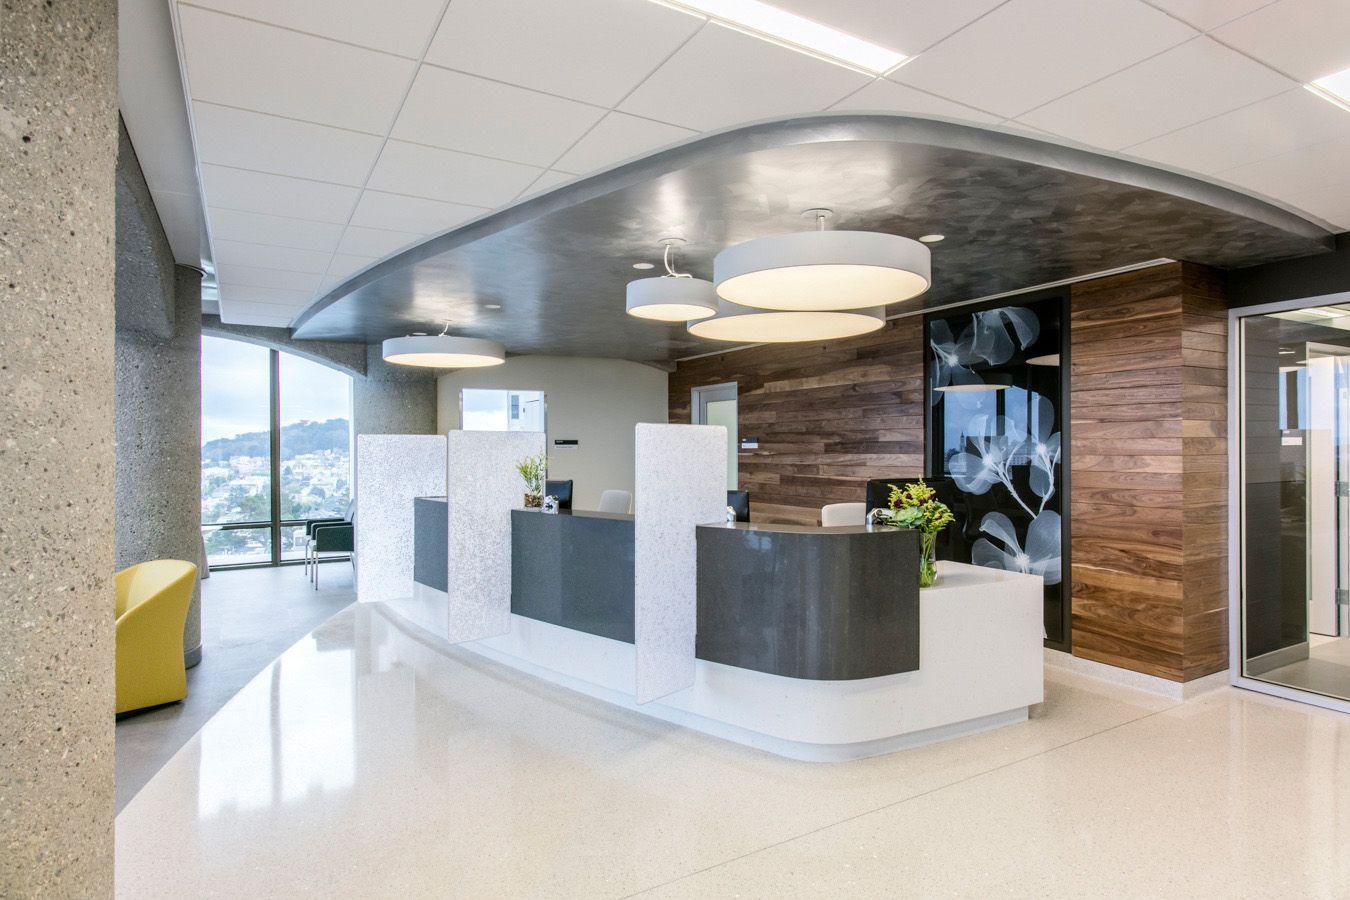 Reception Area At The Ambulatory Care Center 5th Floor Heart Vascular Clinic Renovation Medical Clinic Design Hospital Interior Design Clinic Interior Design